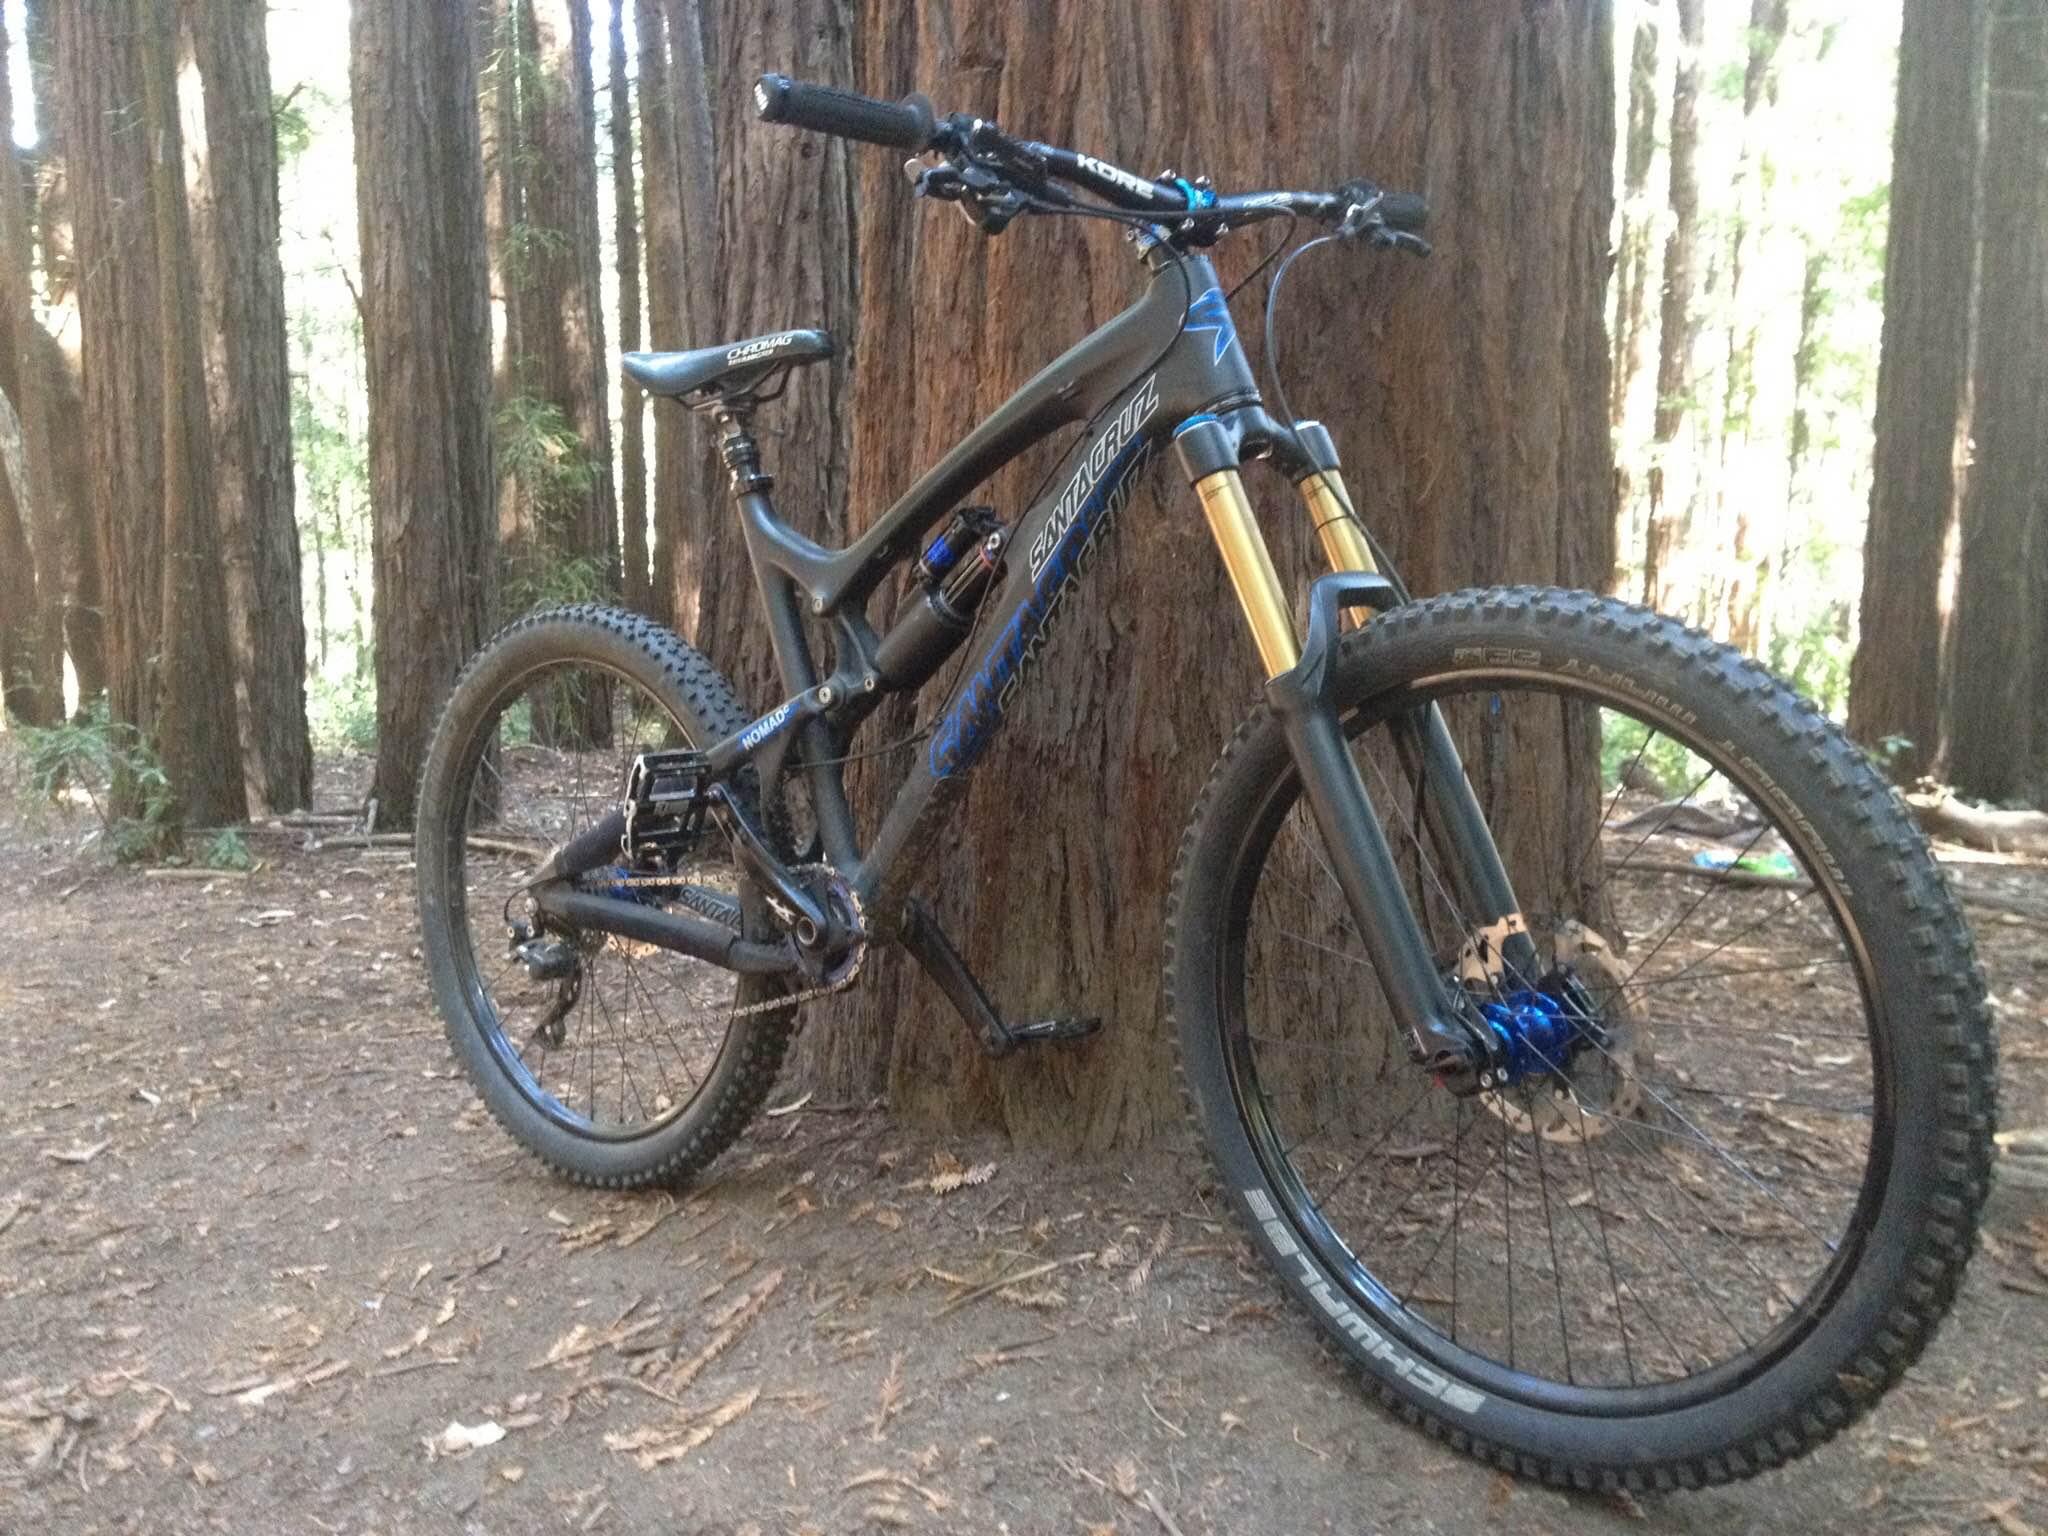 Danny Hogan's Santa Cruz Nomad